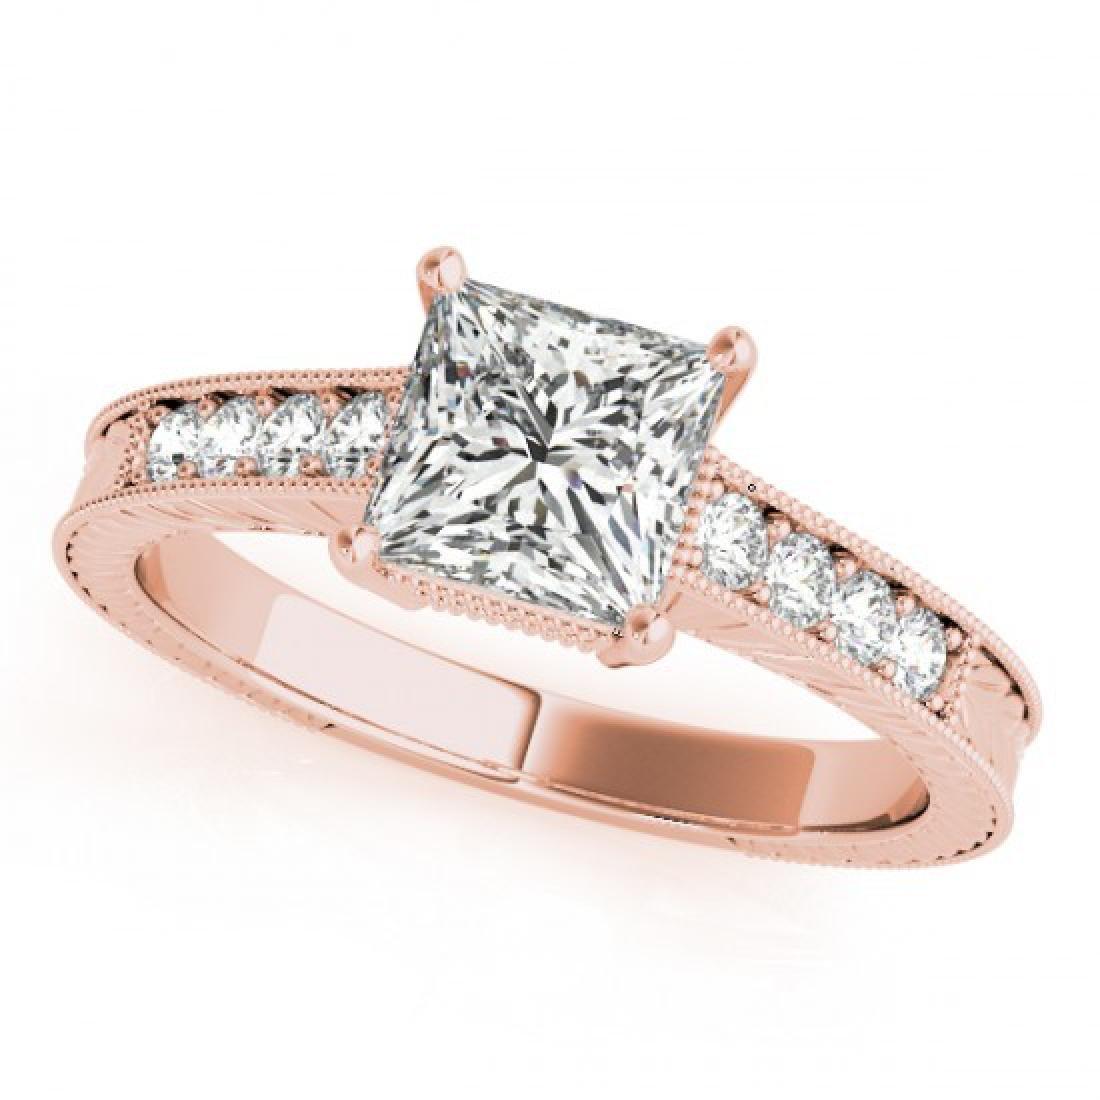 1.2 CTW Certified VS/SI Princess Diamond Solitaire